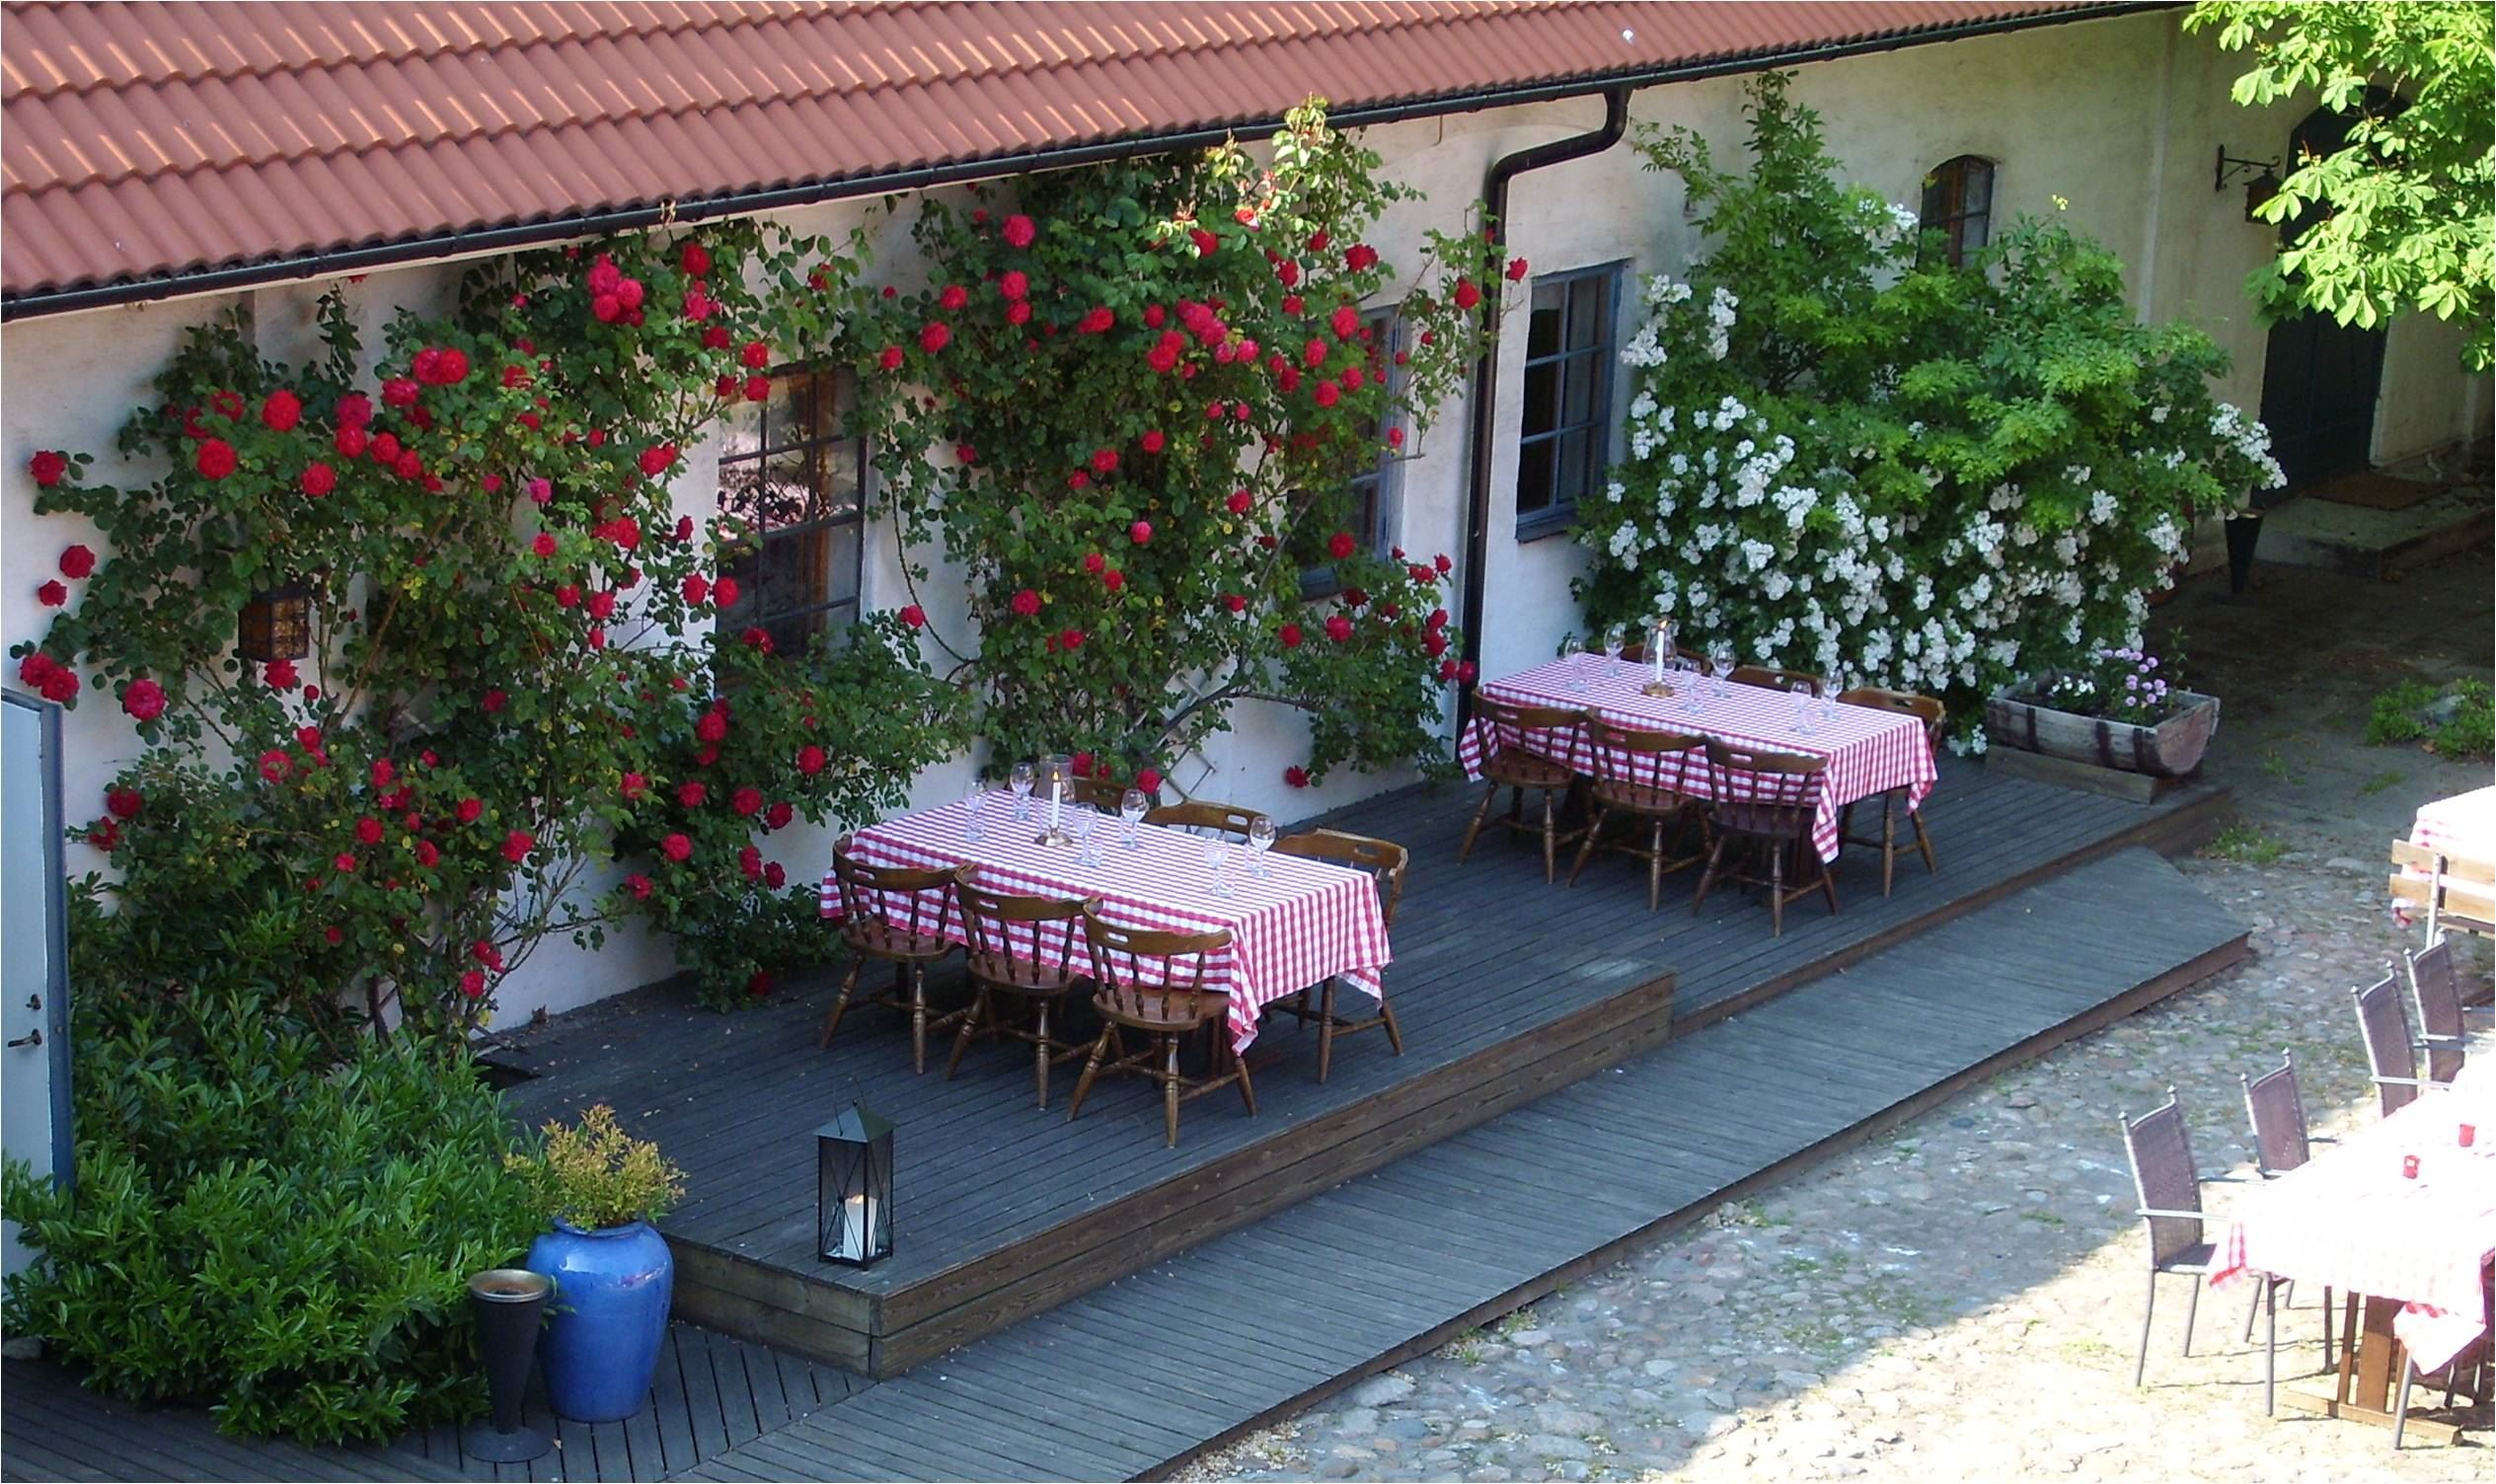 Kastanjelunds Wärdshus restaurant